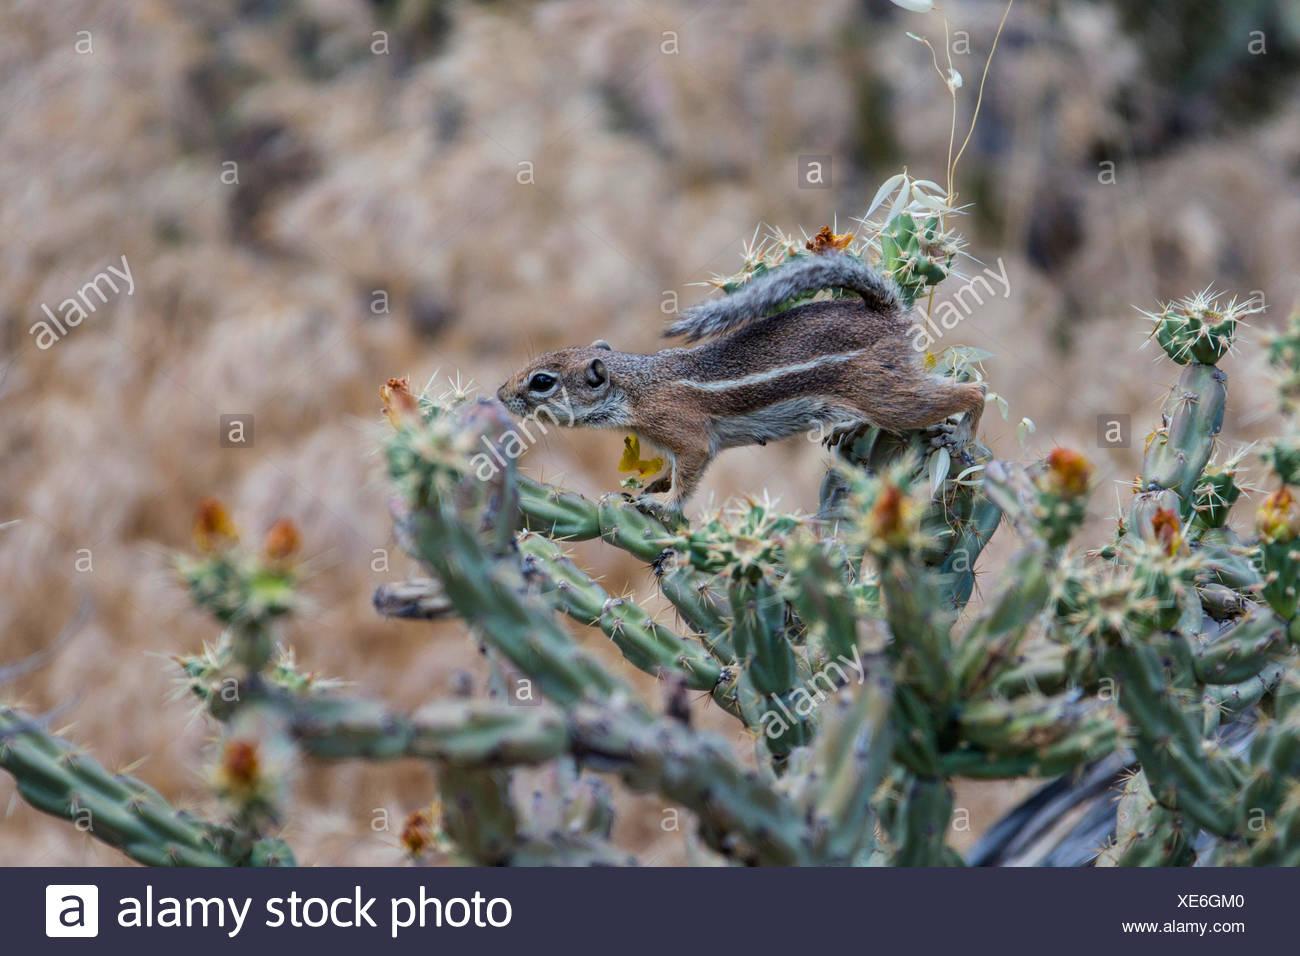 Harris's antelope squirrel (Ammospermophilus harrisii), on Buckhorn Cholla, USA, Arizona, Phoenix Stock Photo